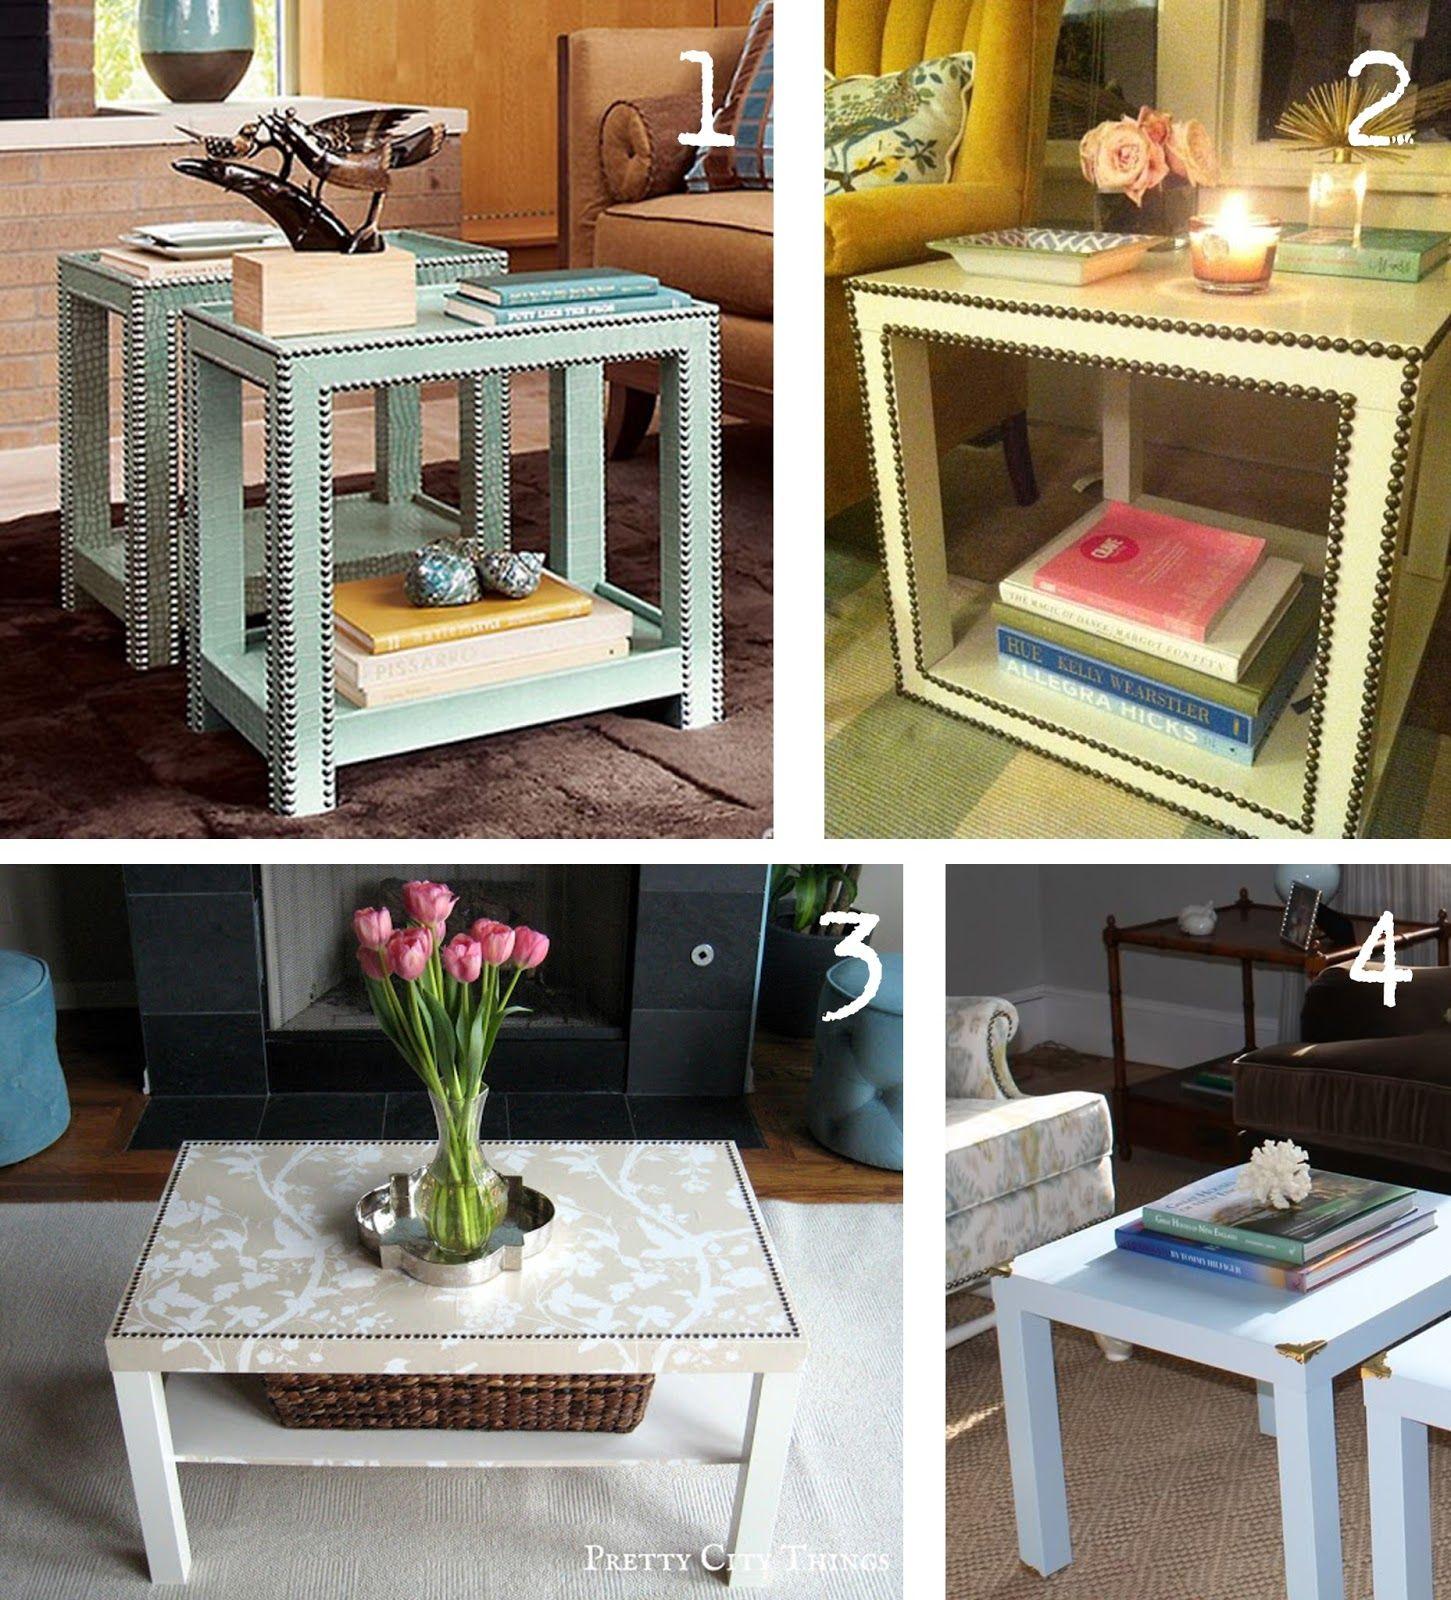 Ikea Hacker Decora Tu Mesa Lack Decoraci N Pinterest  # Customizar Muebles